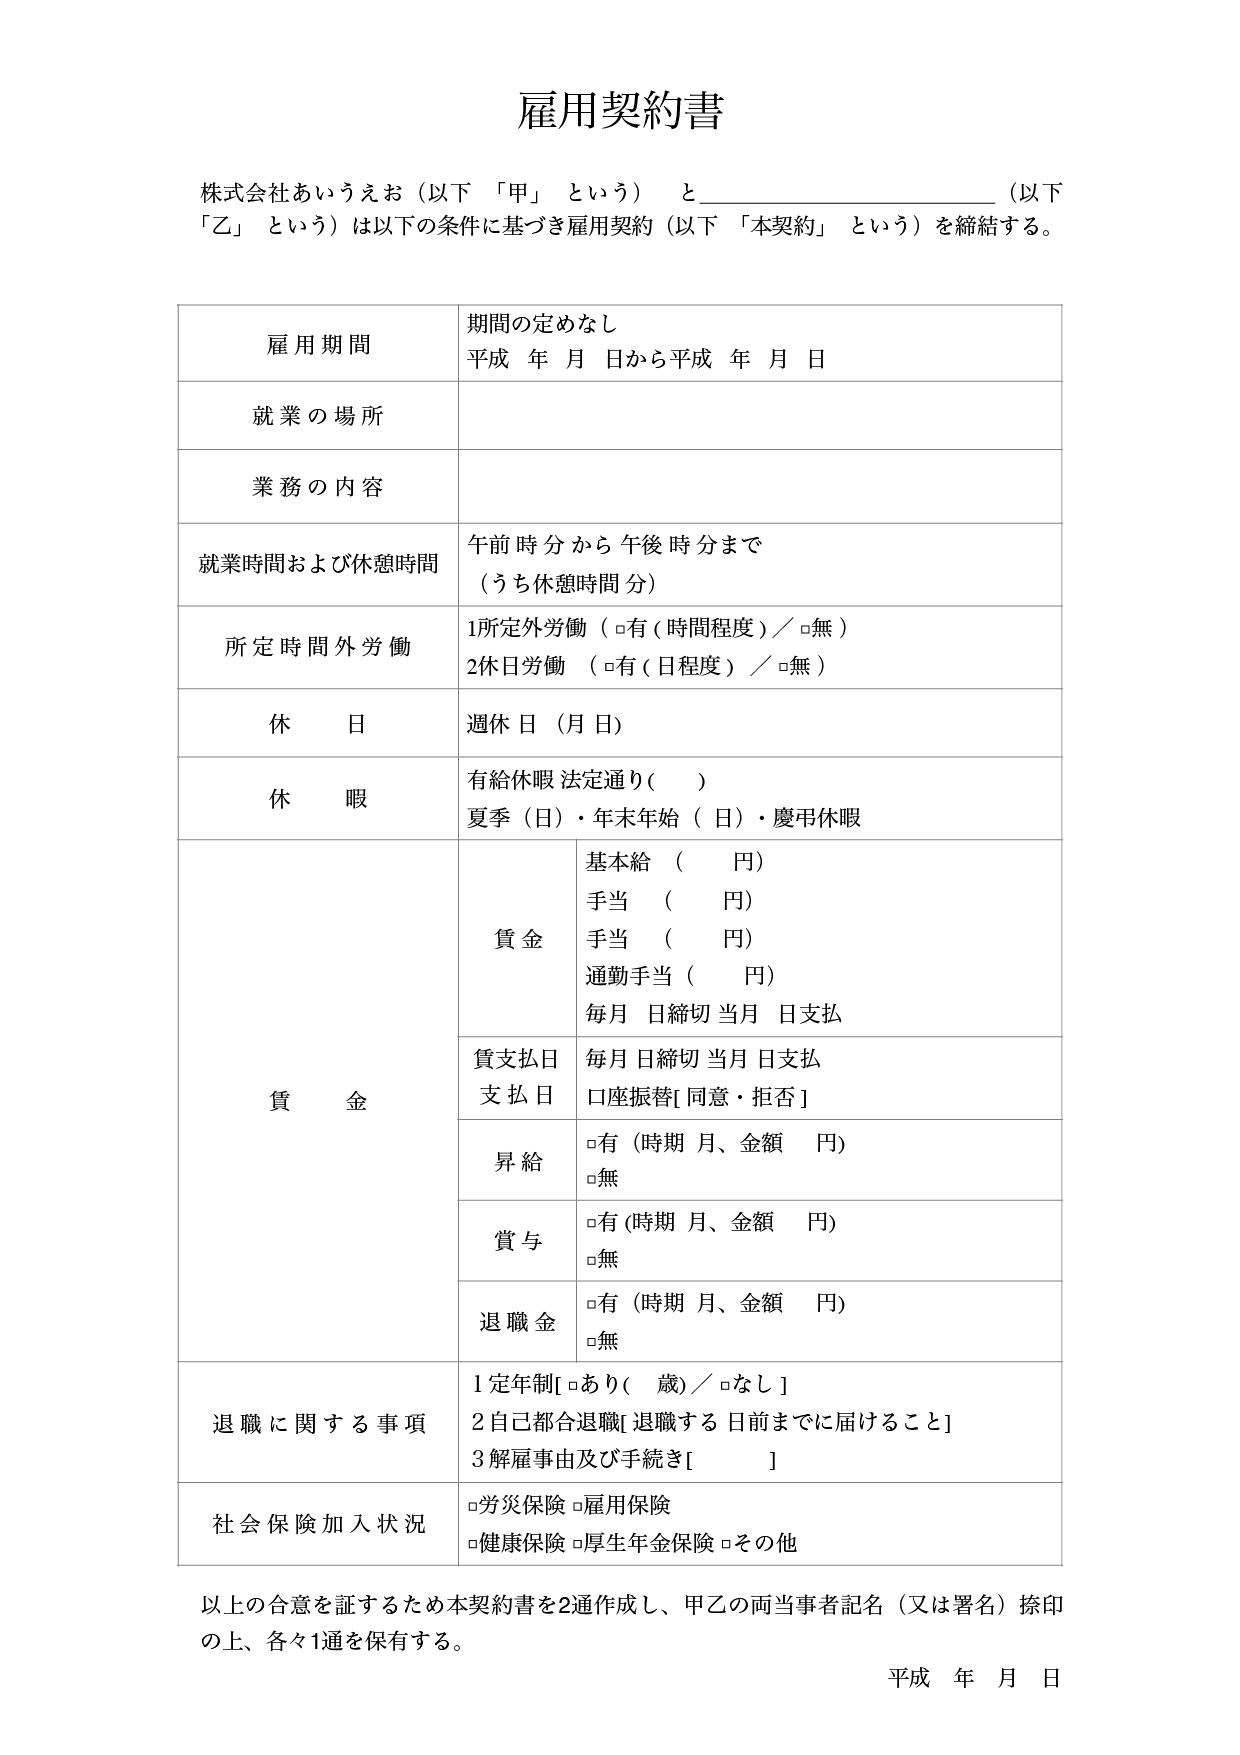 koyoukeiyaku-inkan-01